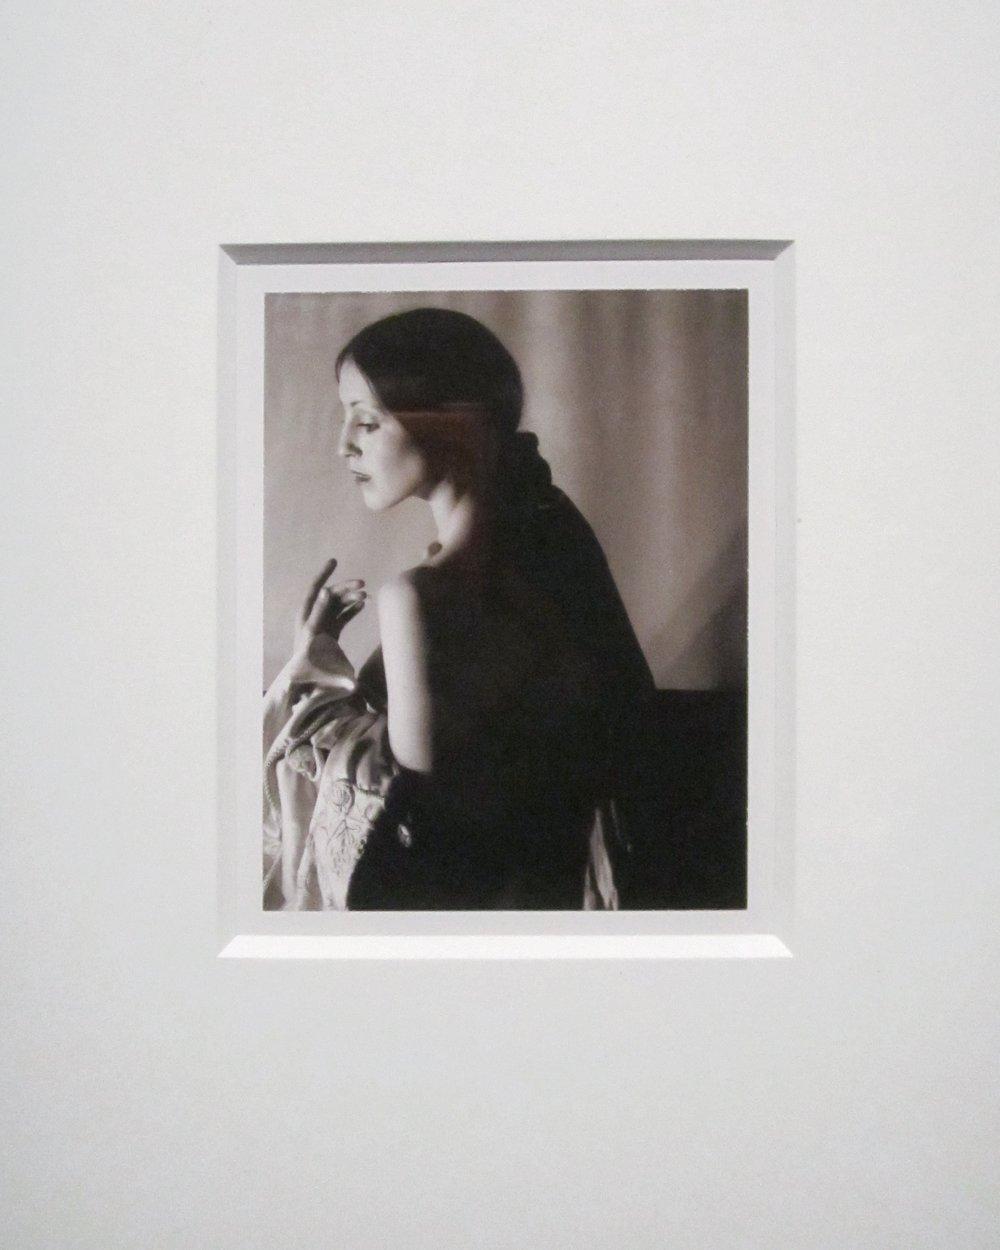 Robert Mapplethorpe, Untitled (Terry), Dye diffusion transfer print, 1974.